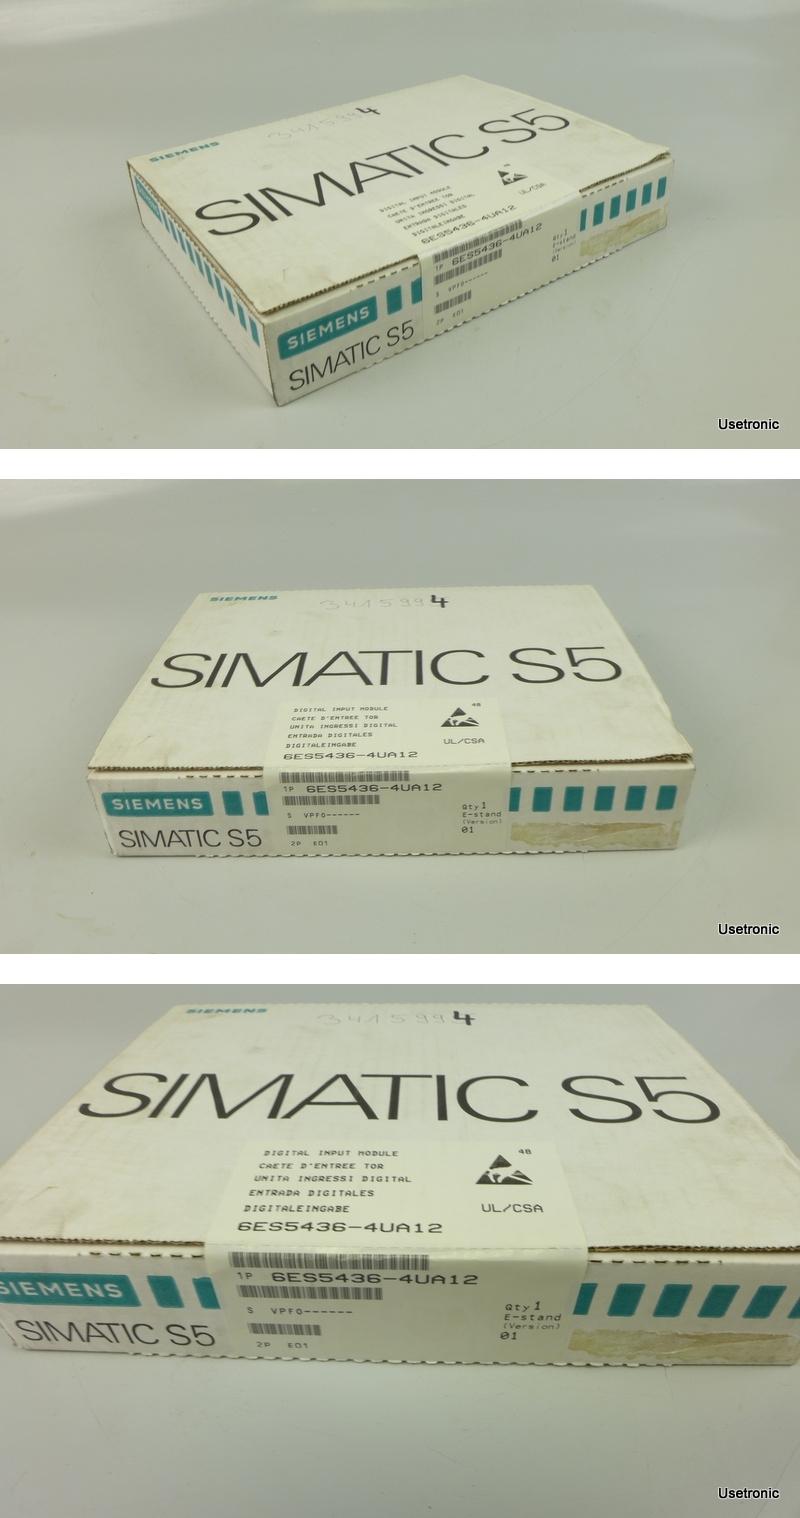 Siemens 6ES5436-4UA12